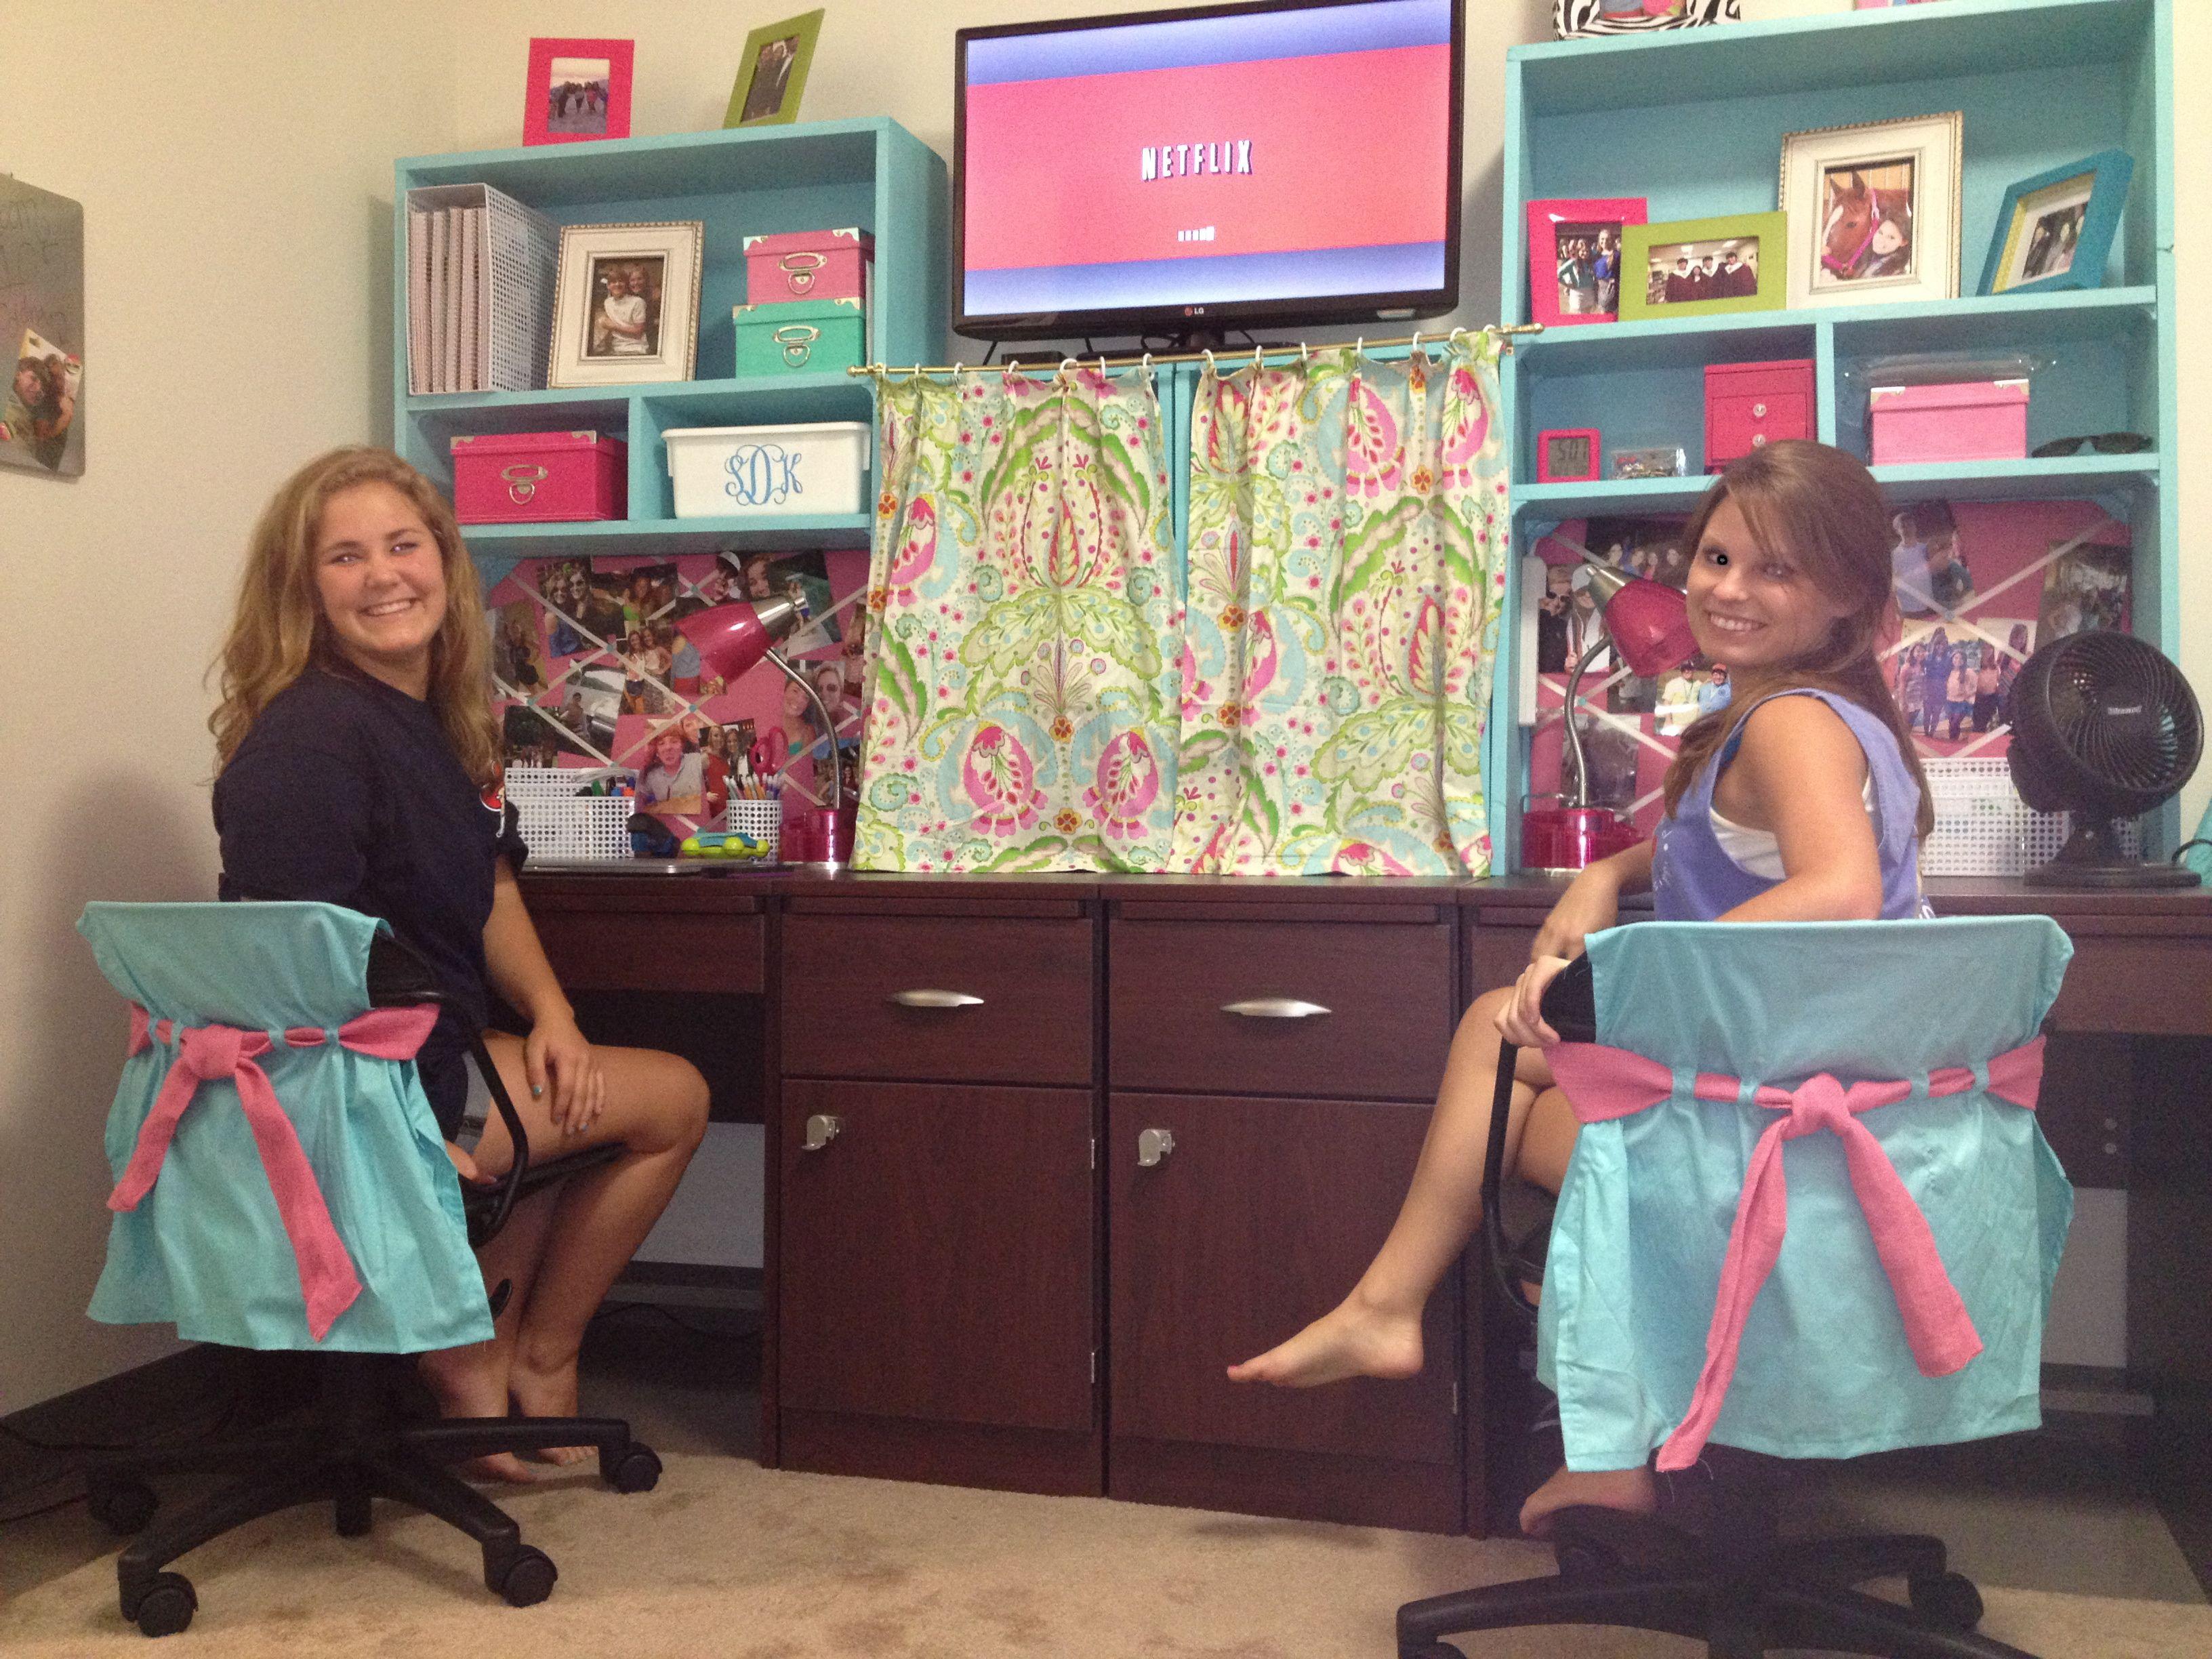 Ole Miss Ridge South Dorm Room Ideas Pinterest